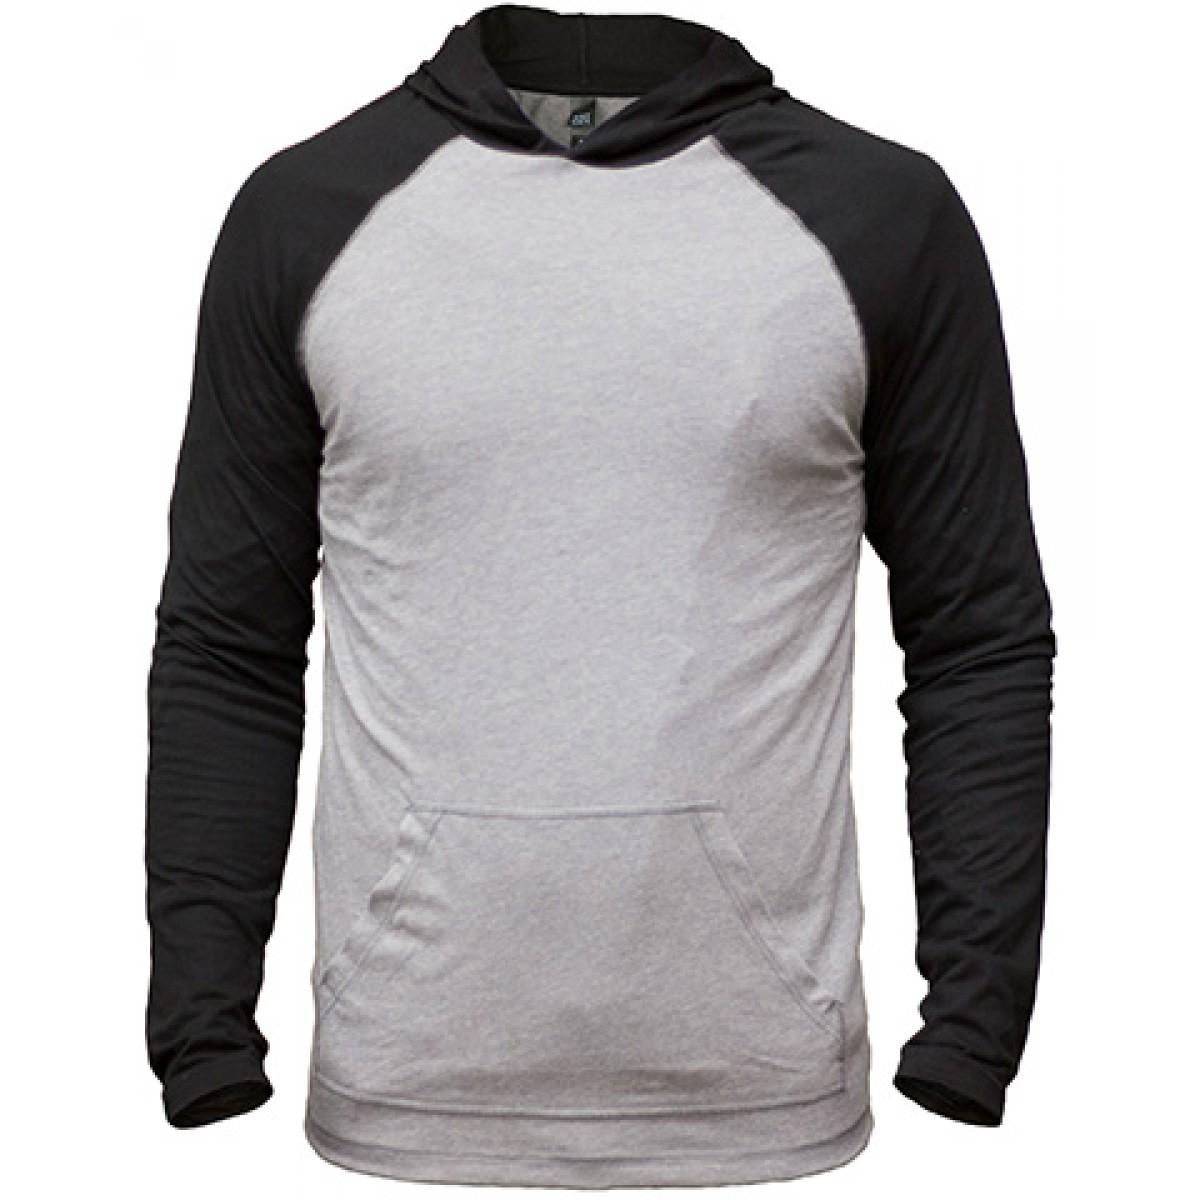 50/50 Raglan Hoodie-Gray/Black-XS